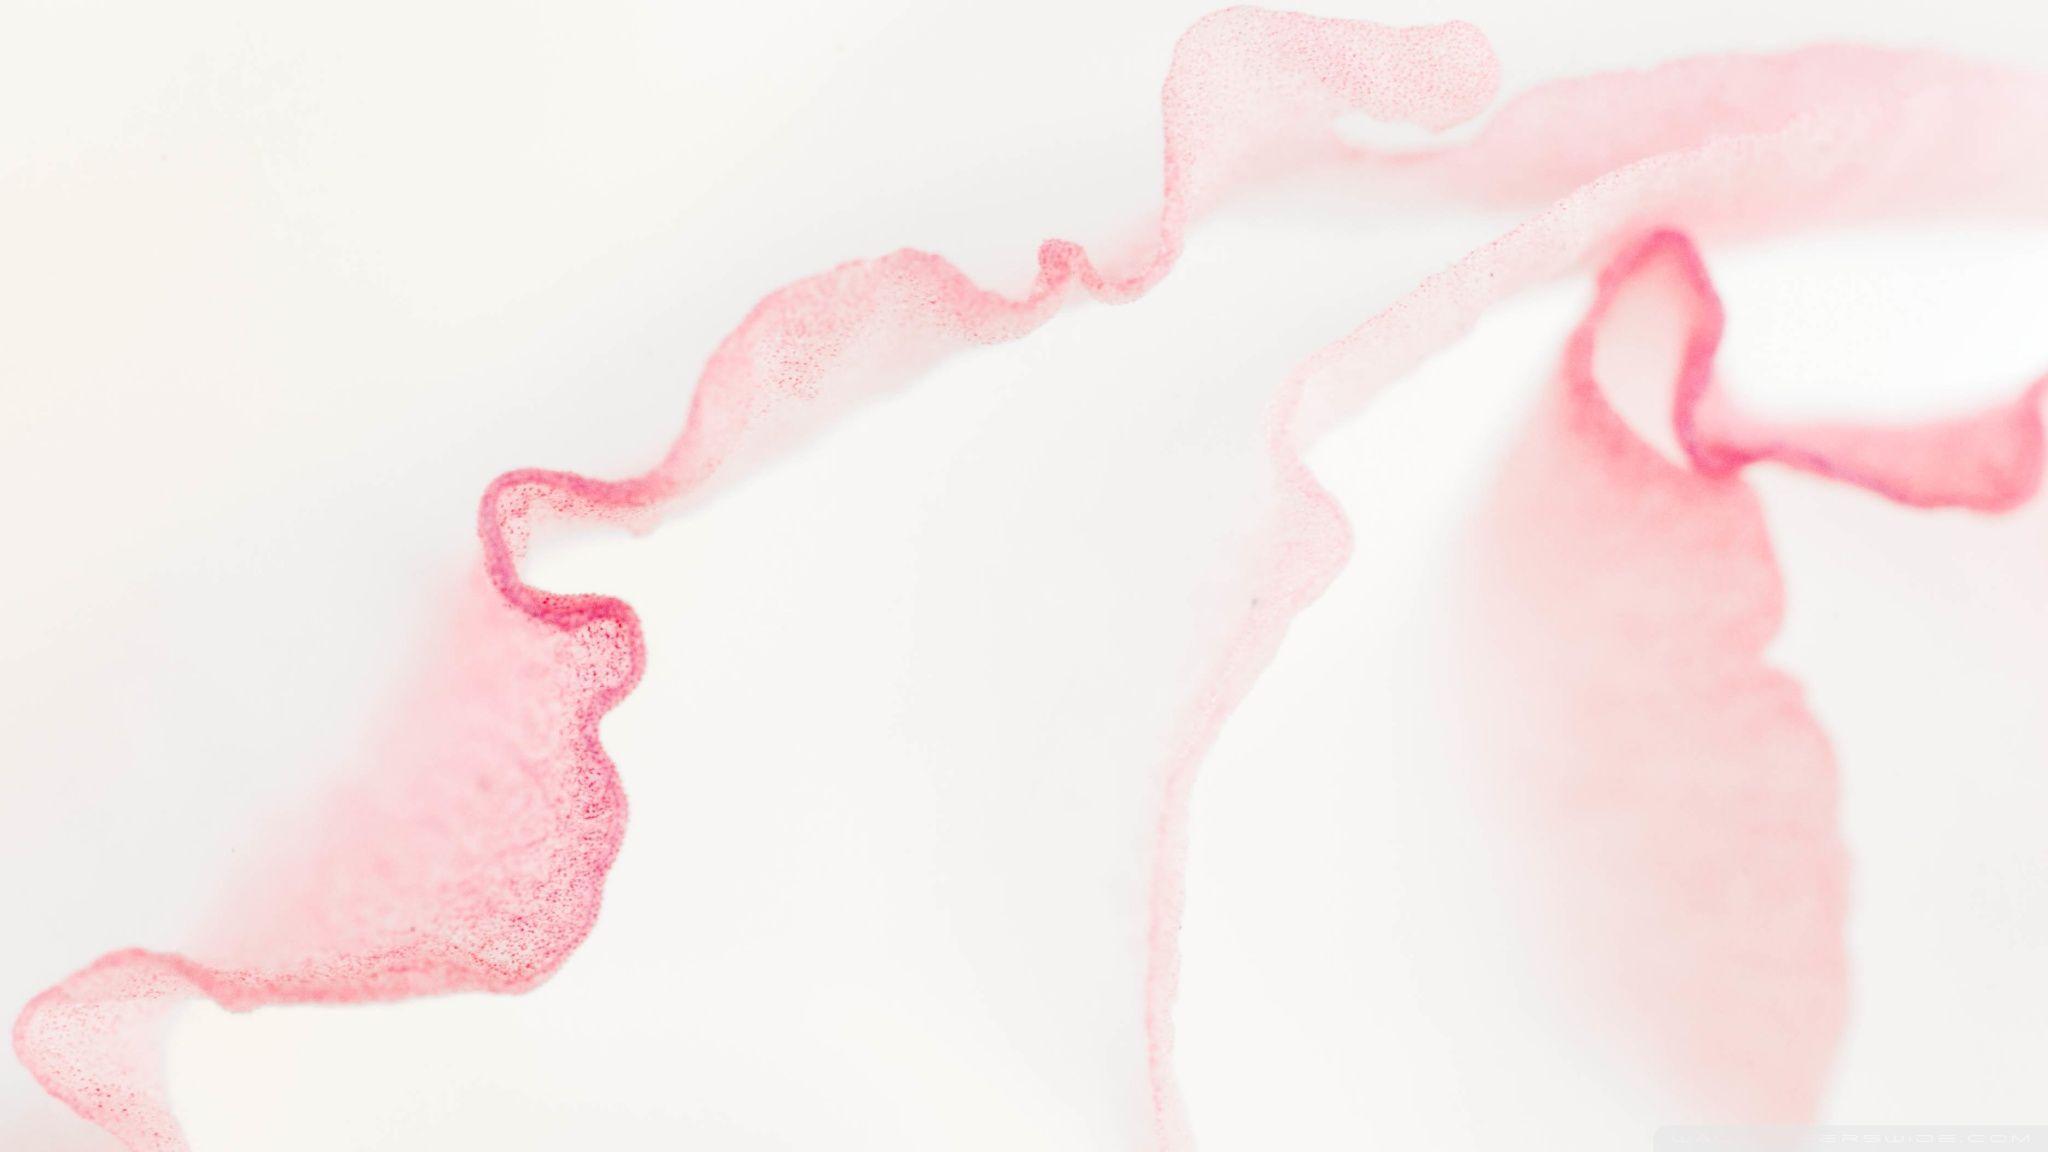 Pink Macbook Wallpapers Top Free Pink Macbook Backgrounds Wallpaperaccess Written by admin saturday, october 17, 2020 edit. pink macbook wallpapers top free pink